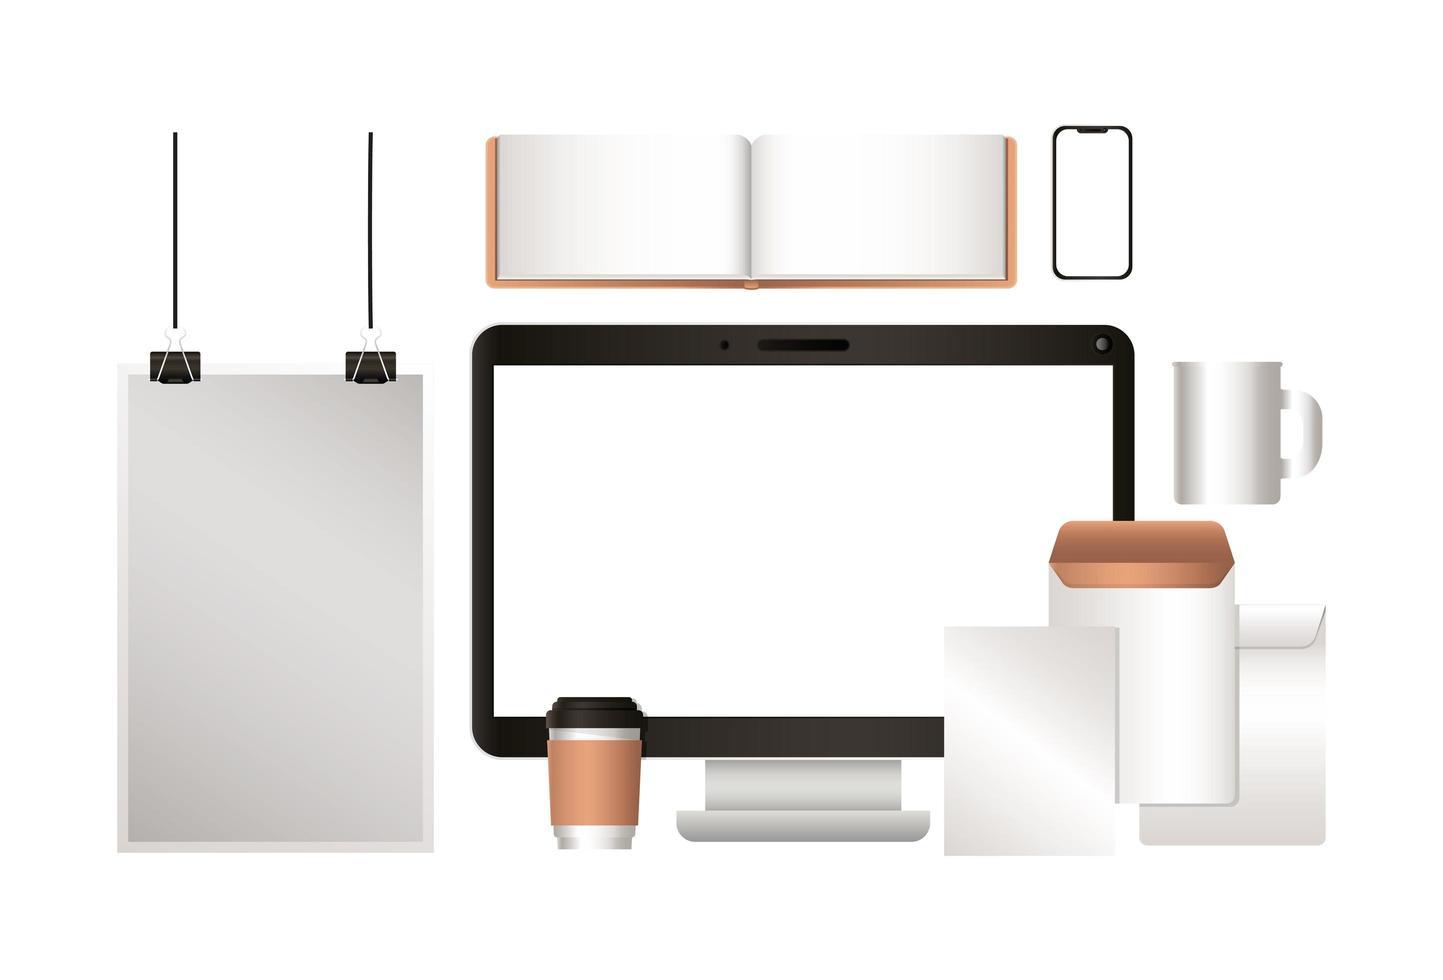 Mockup computer notebook envelopes and coffee mugs design vector